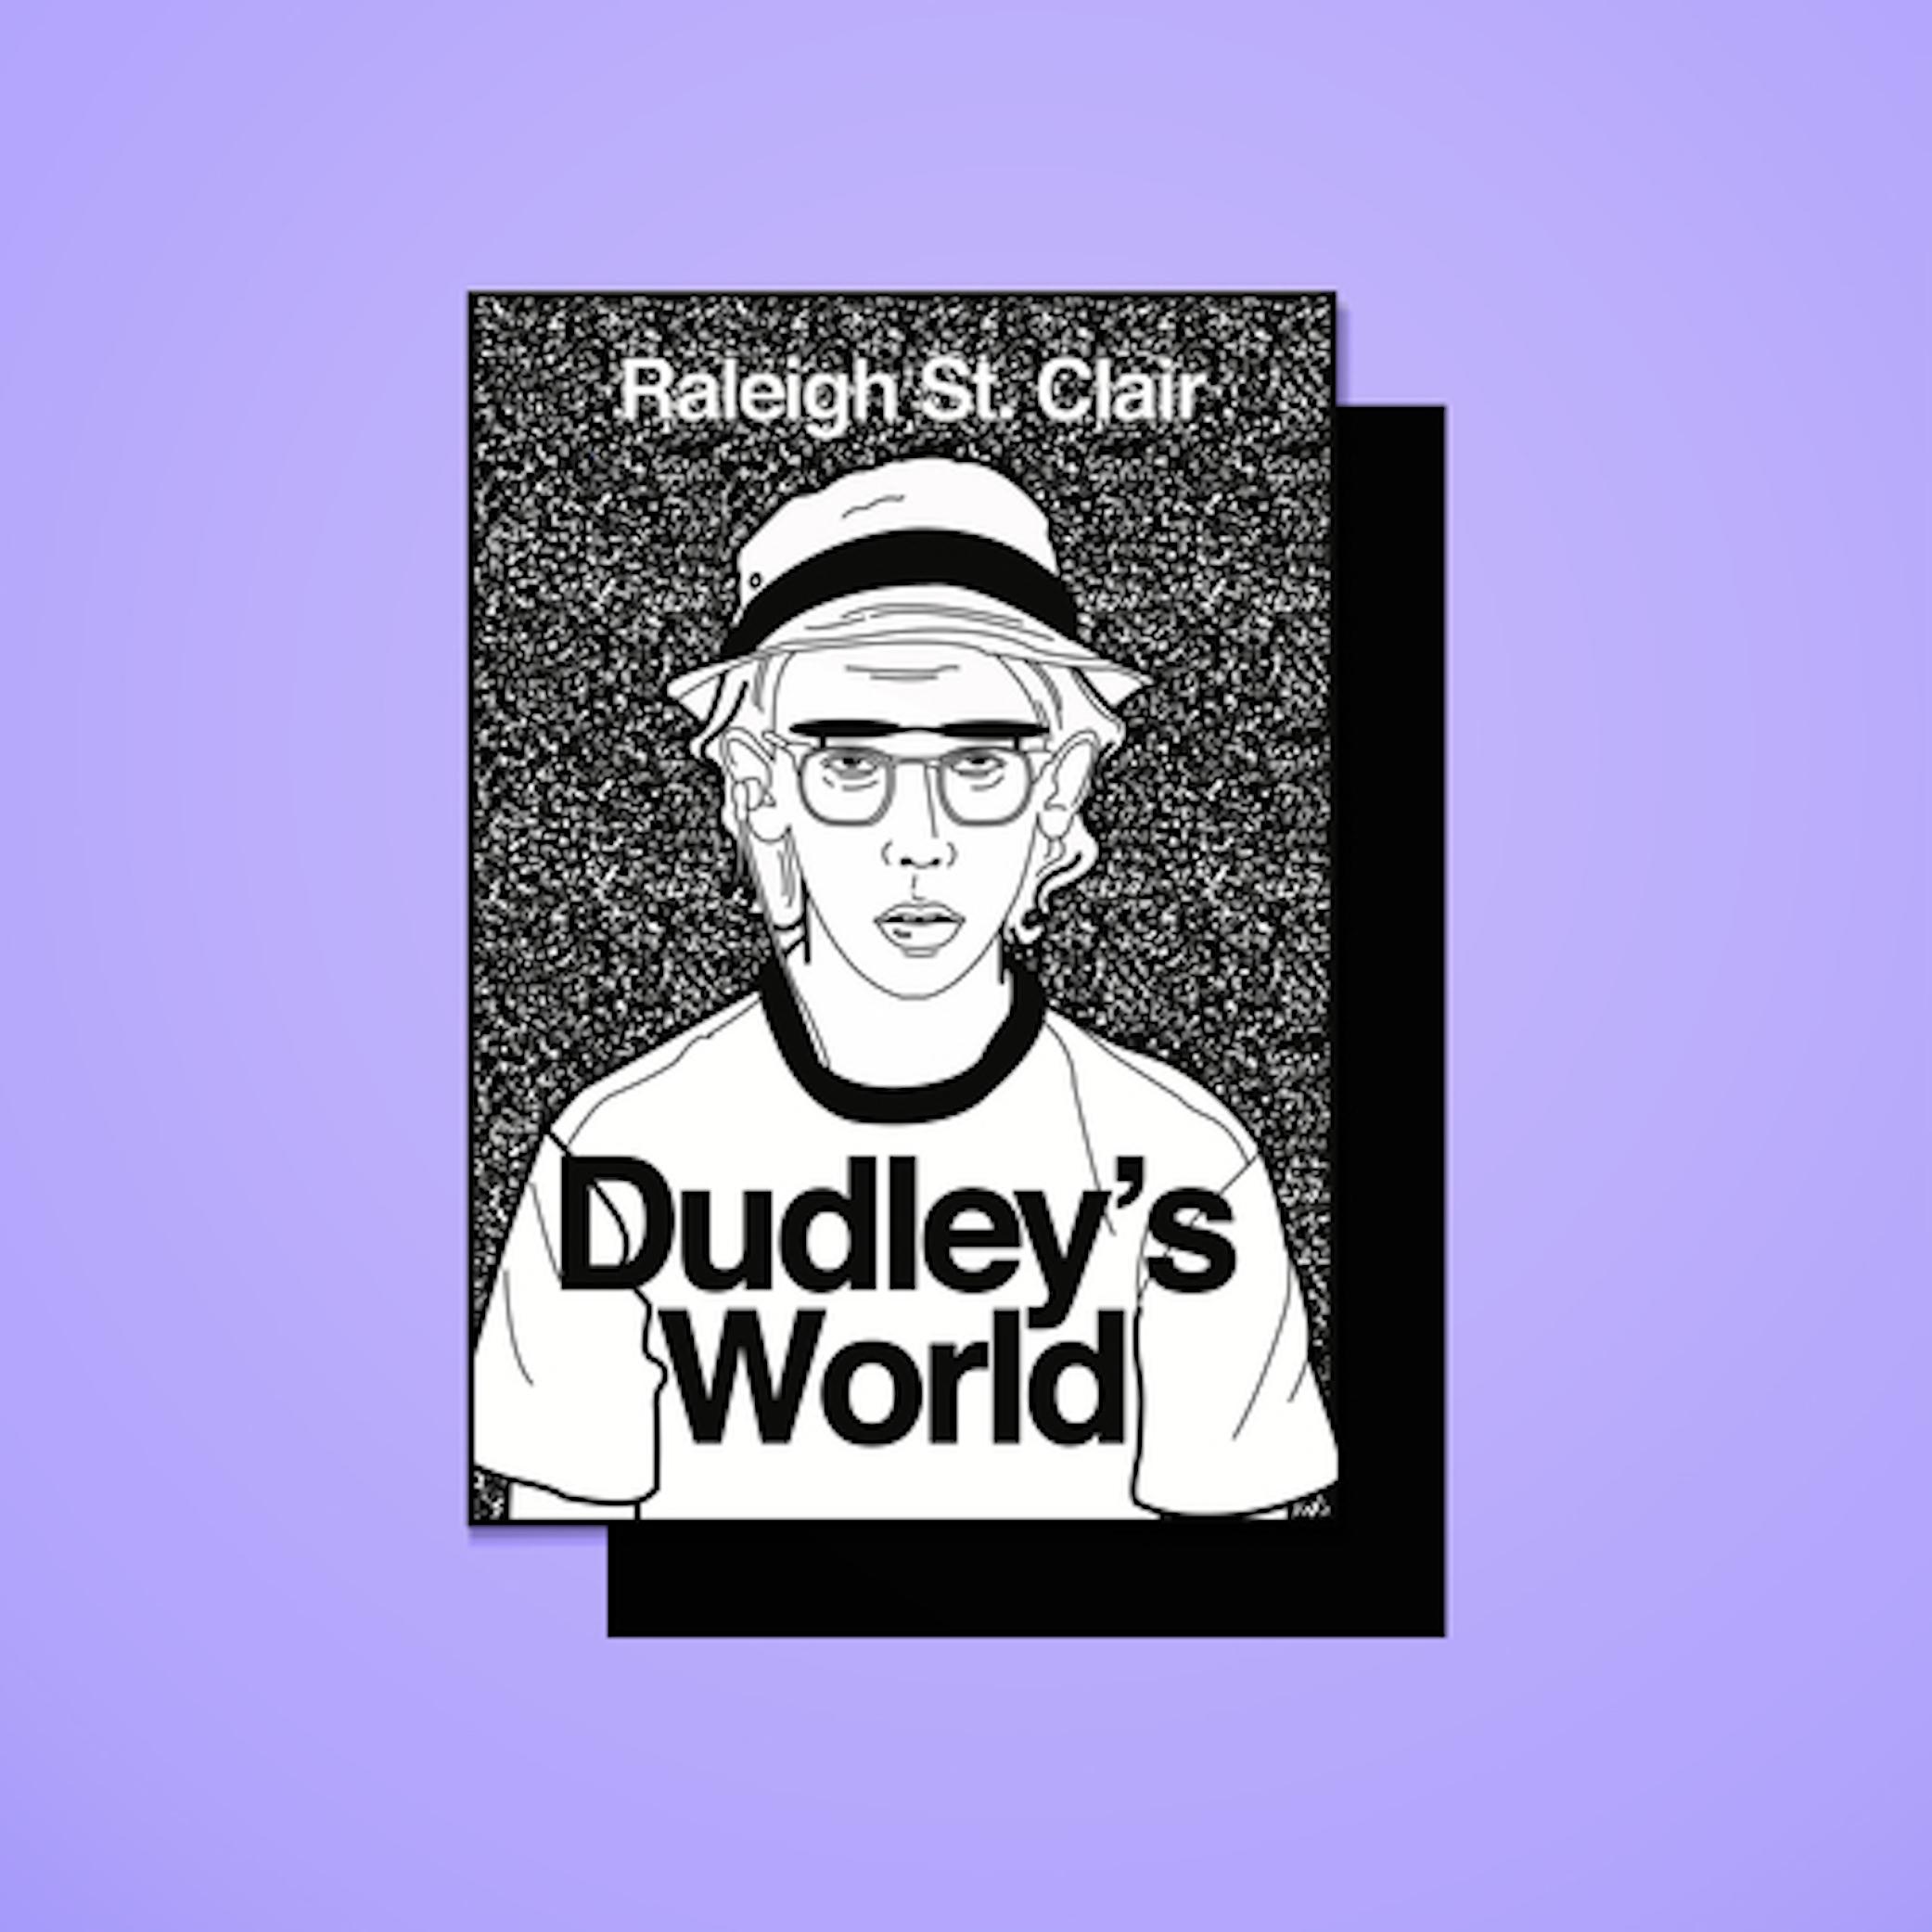 dudley+.jpg